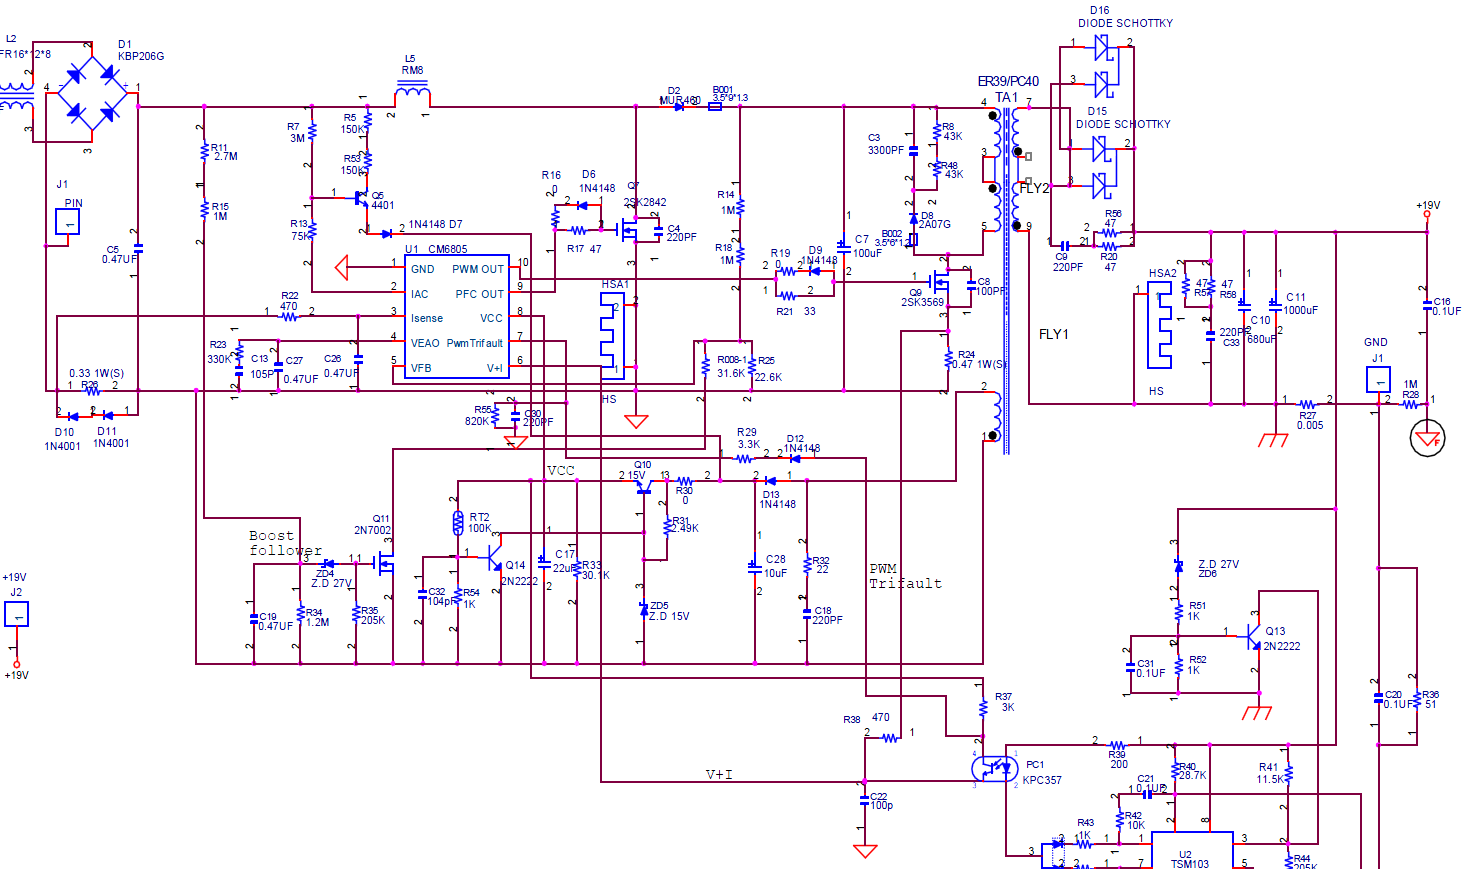 Lec 993 rev 1.4 схема